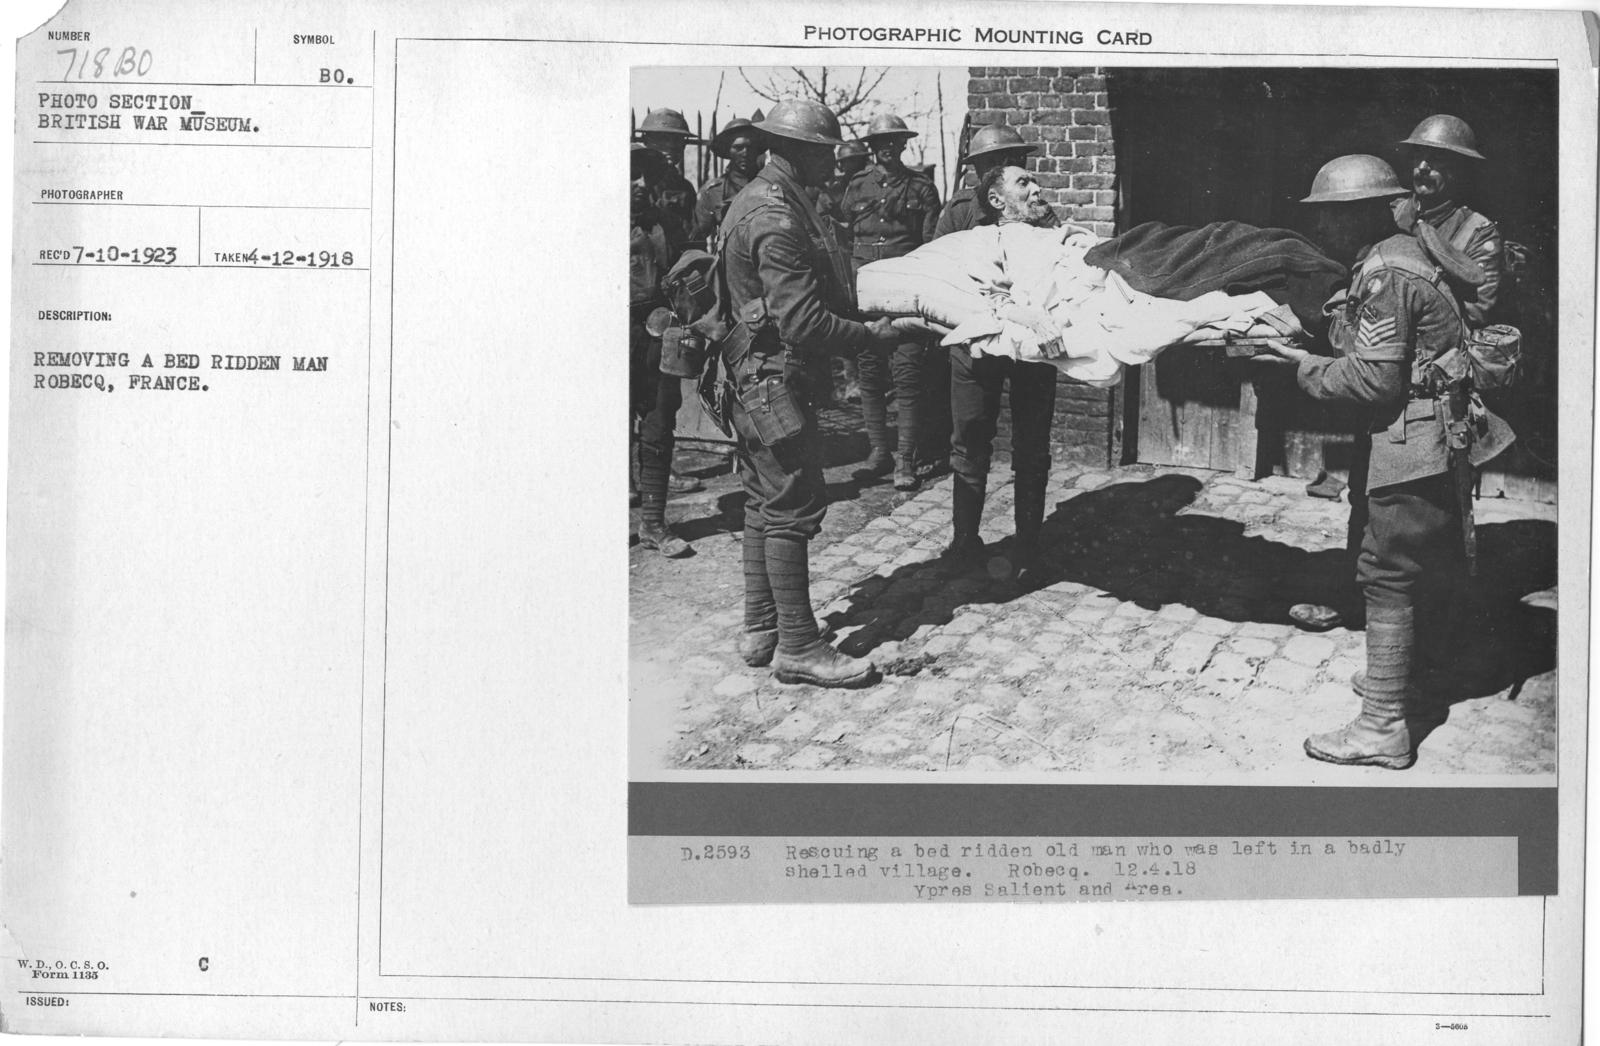 Removing a bed ridden man Robecq, France. 4-12-1918